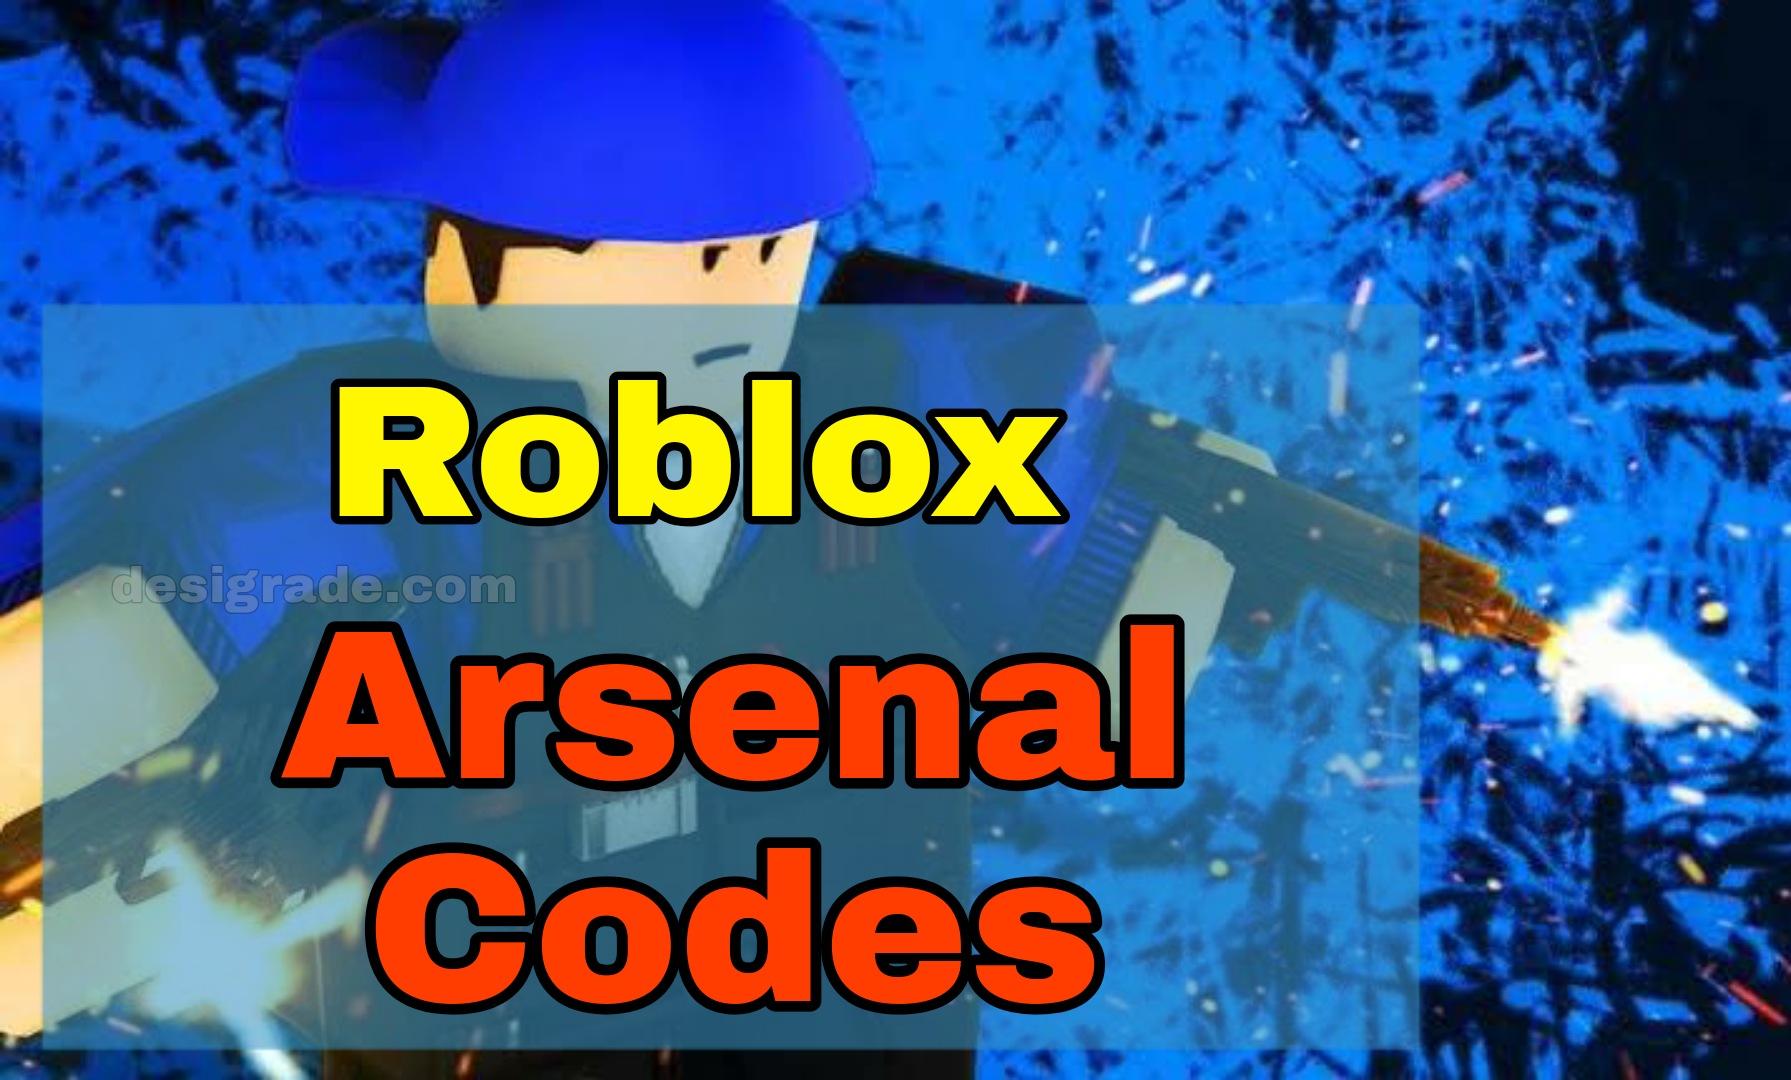 arsenal codes roblox january 2021